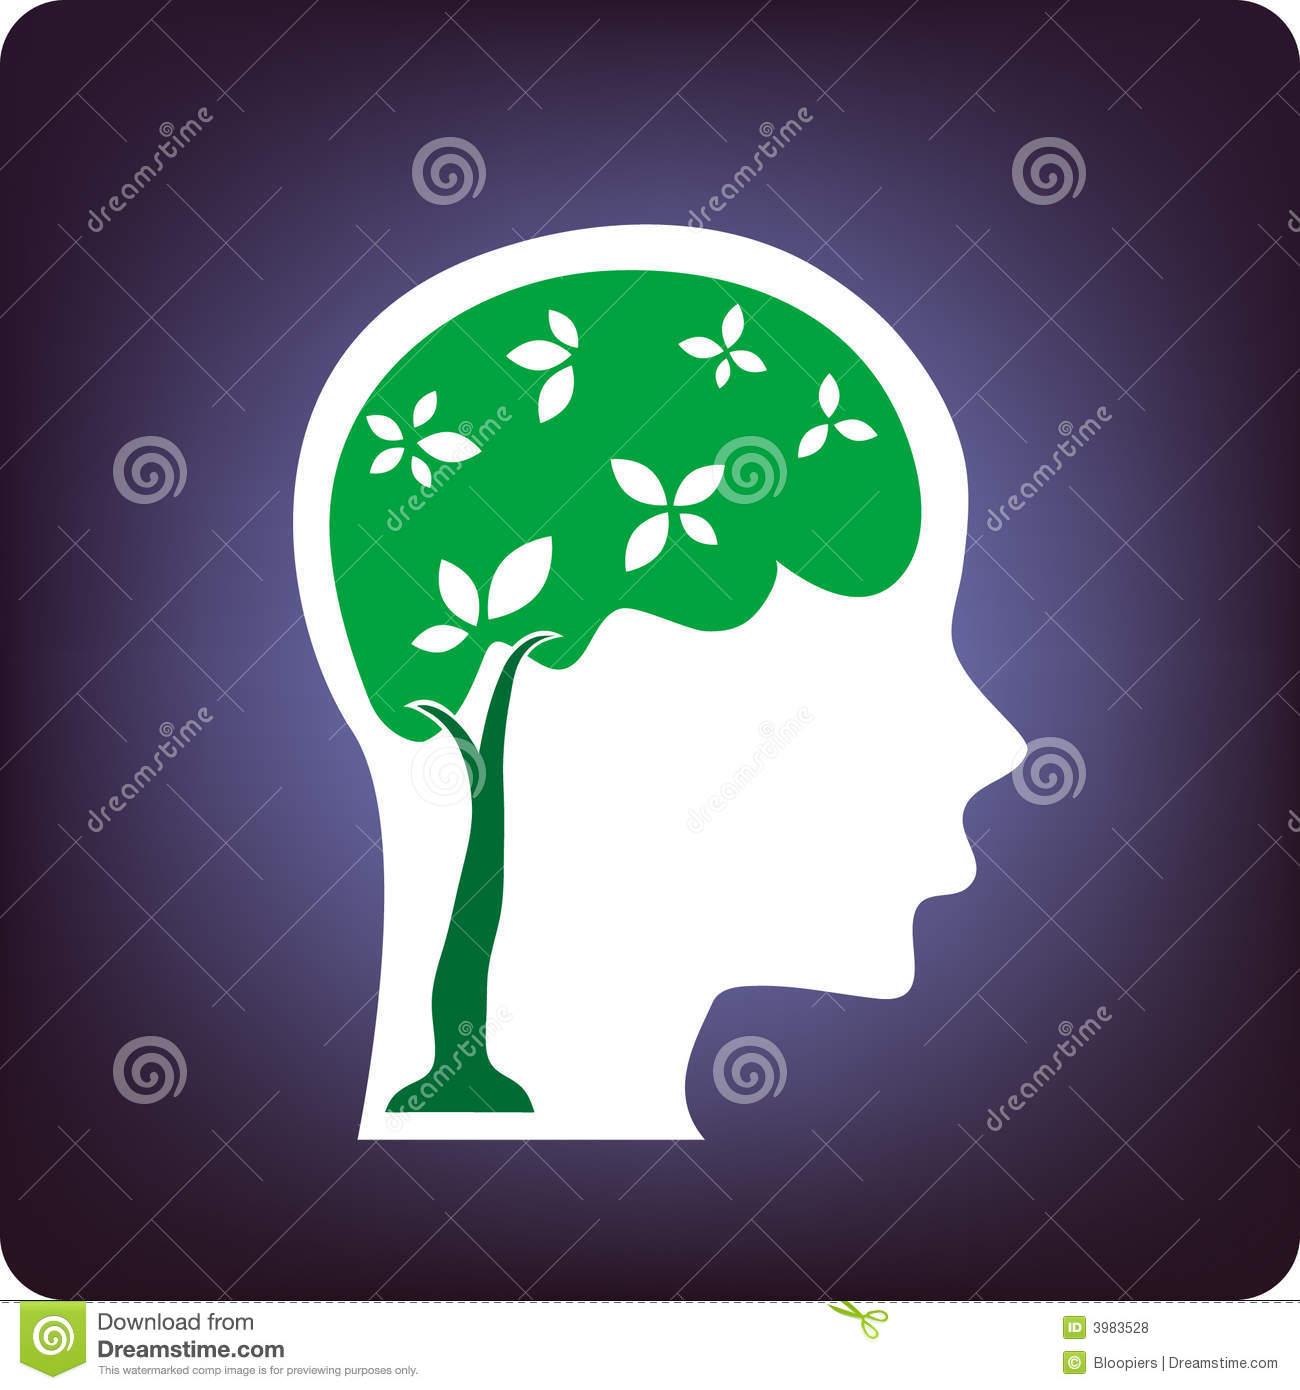 Growing Brain Royalty Free Stock Photos.